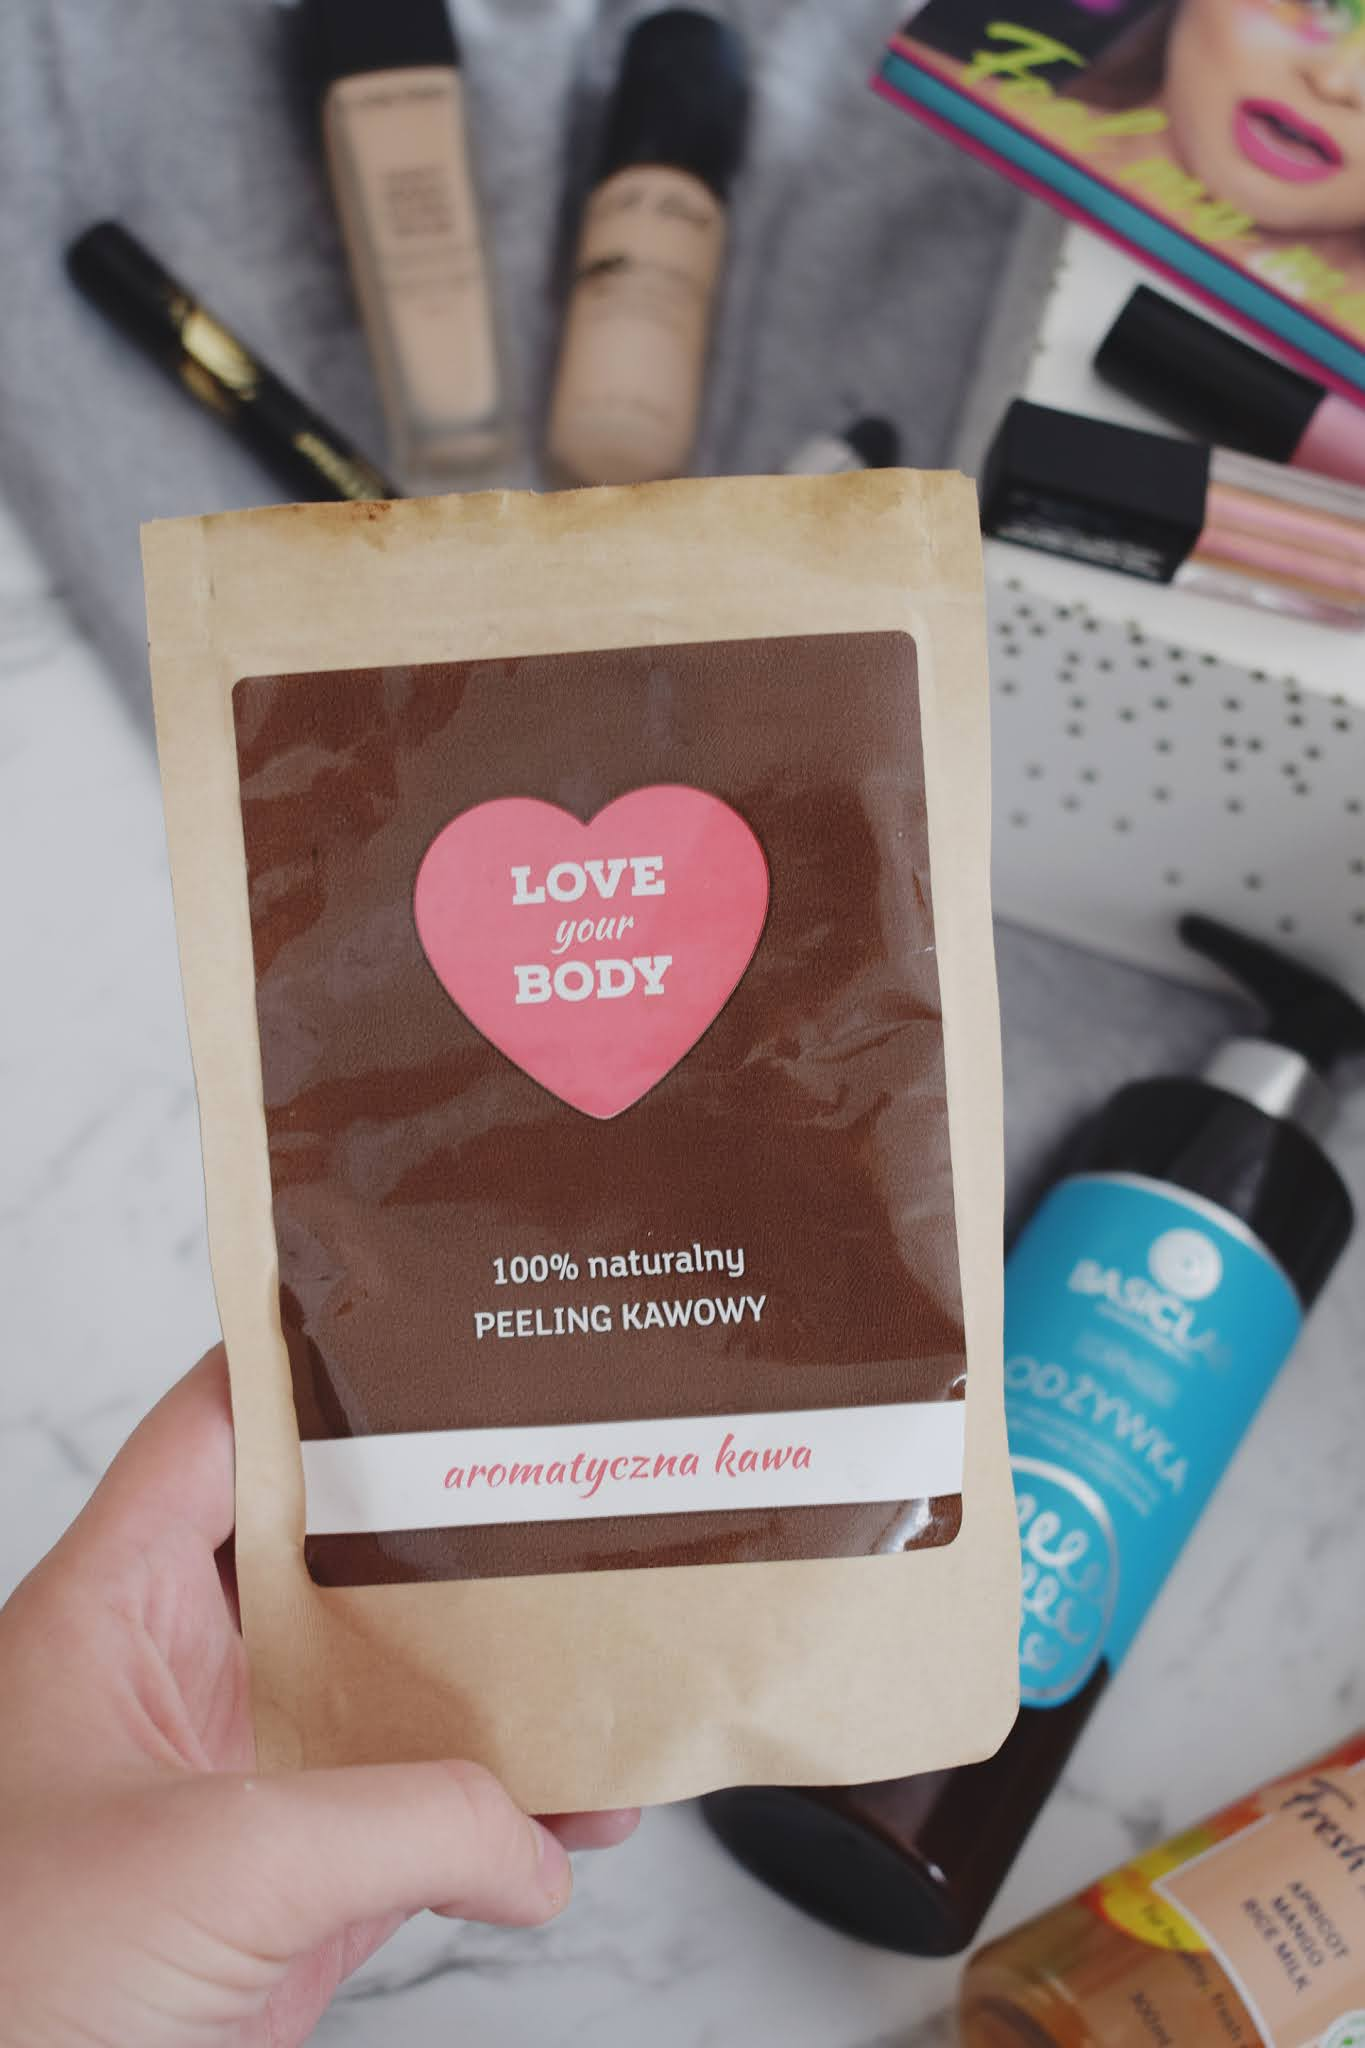 love your body peeling kawowy